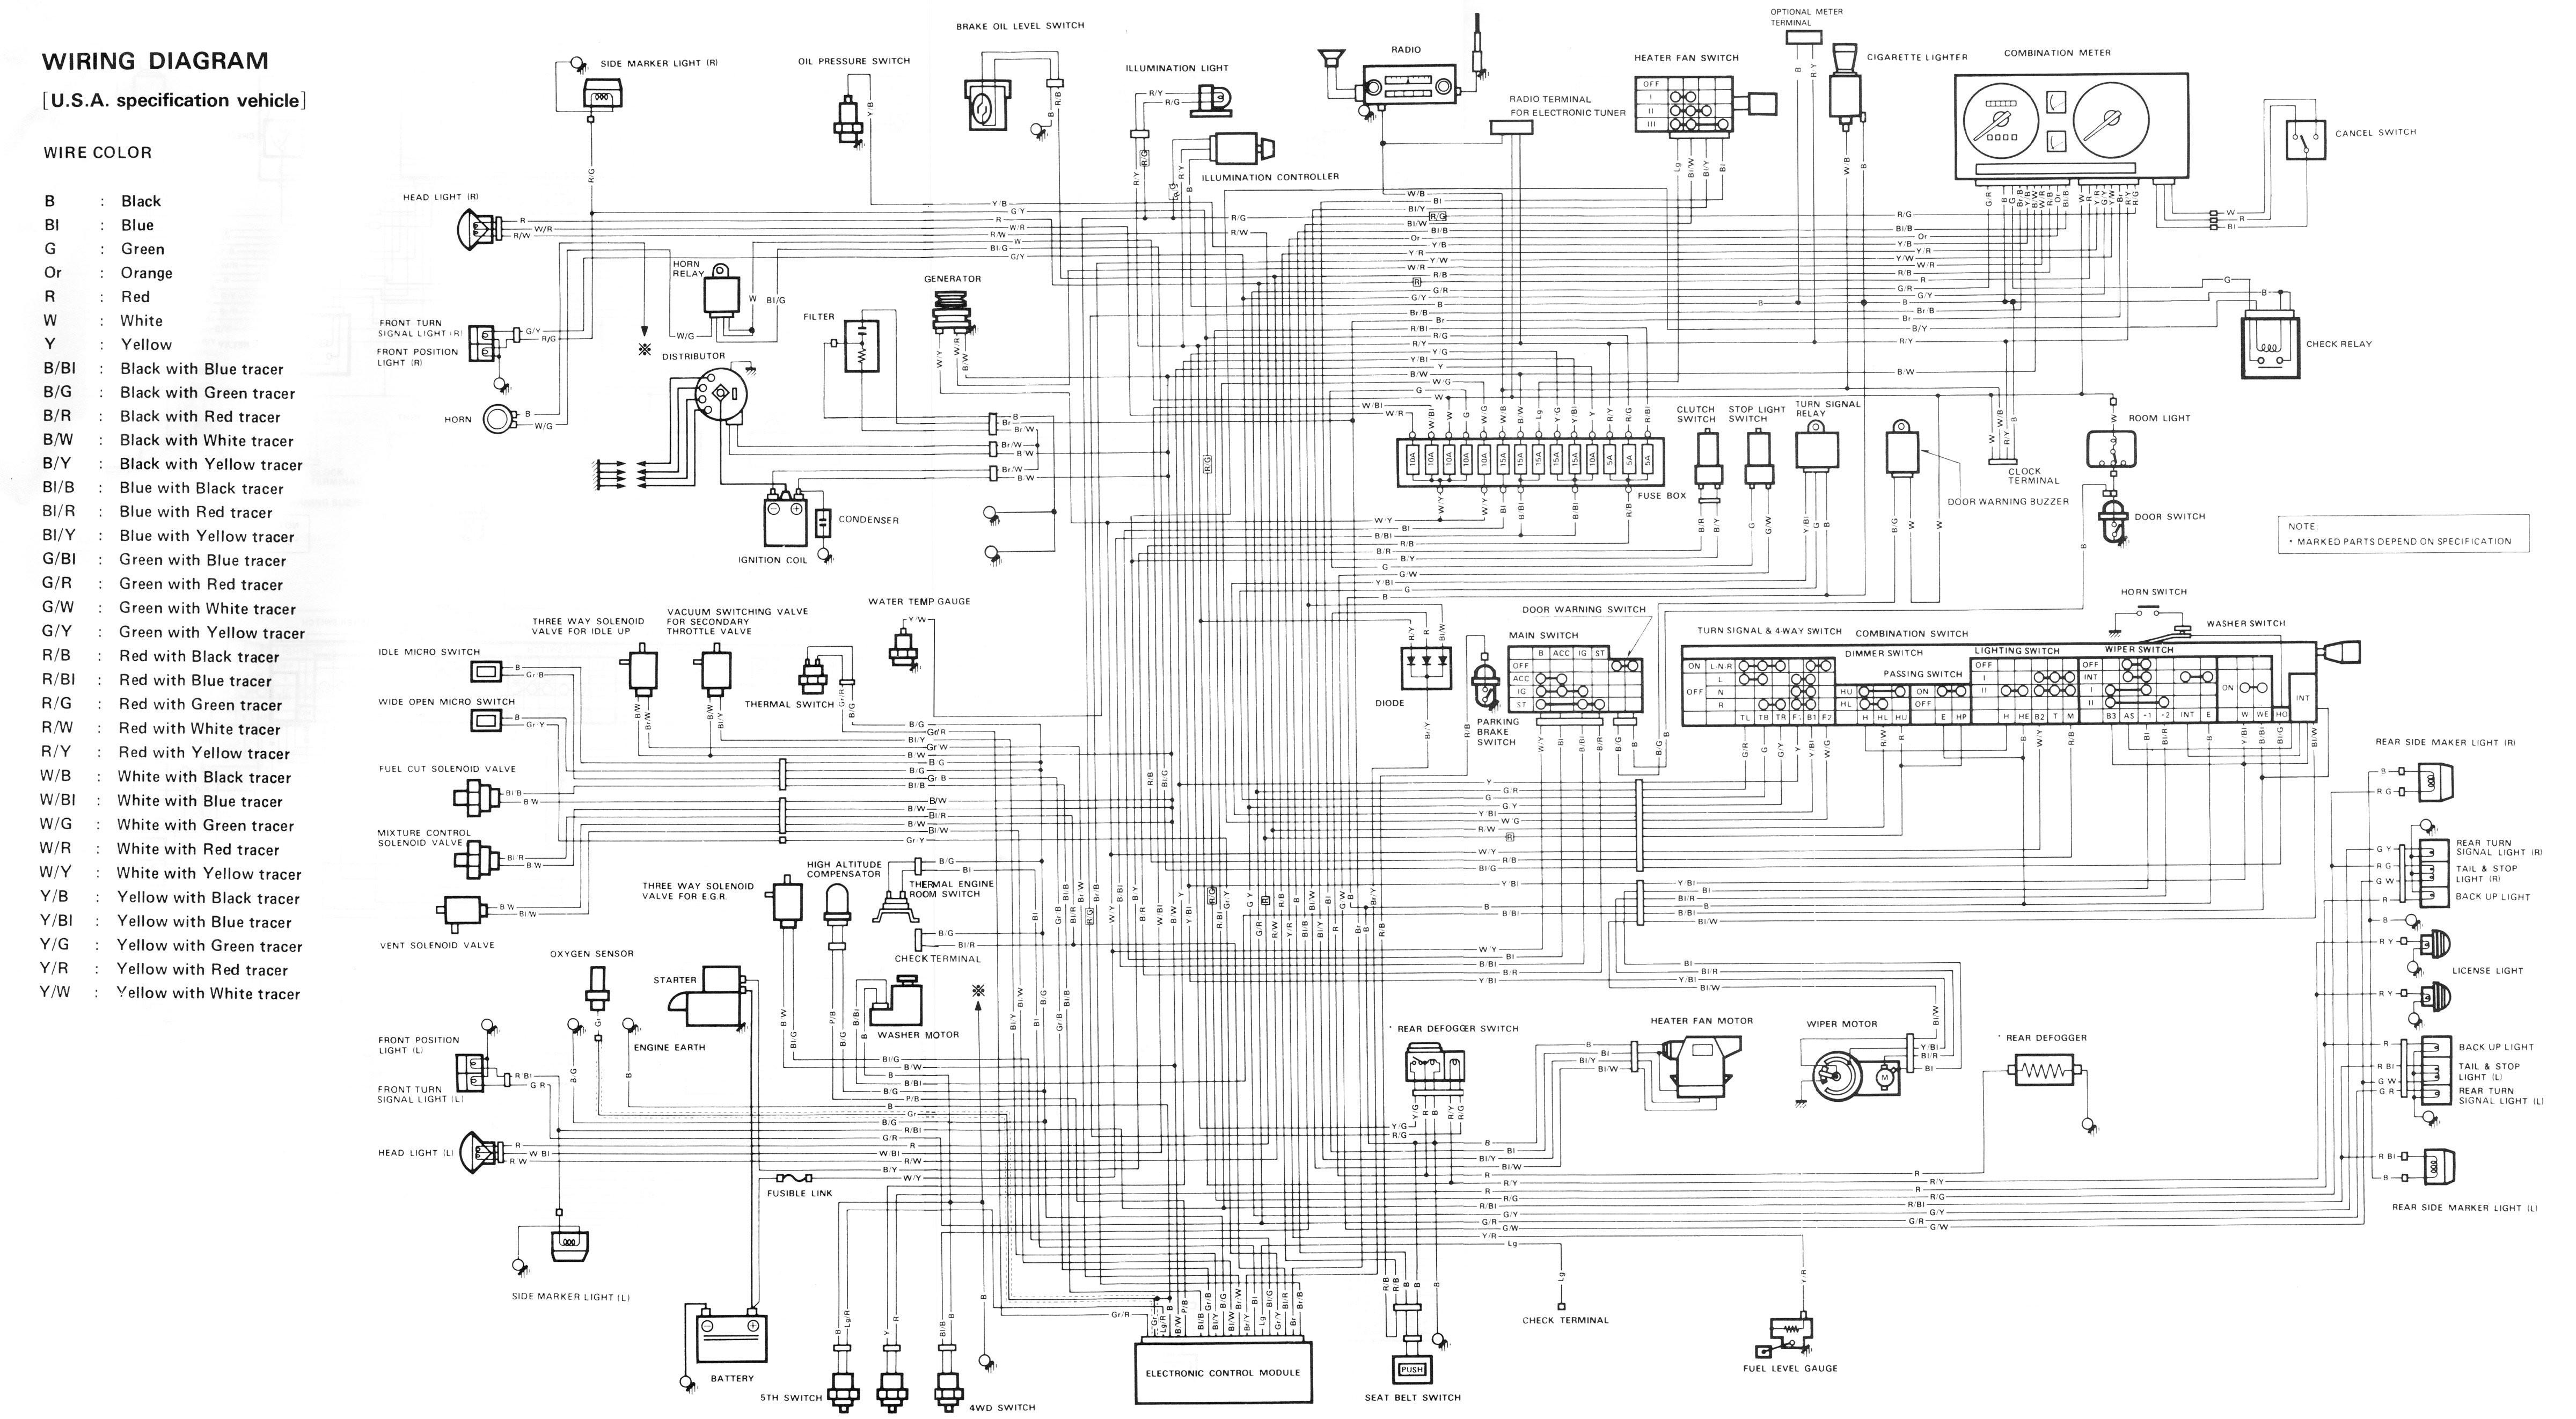 1988 Suzuki Samurai Wiring Diagram 3839 1986 toyota Cressida Wiring Diagram Of 1988 Suzuki Samurai Wiring Diagram